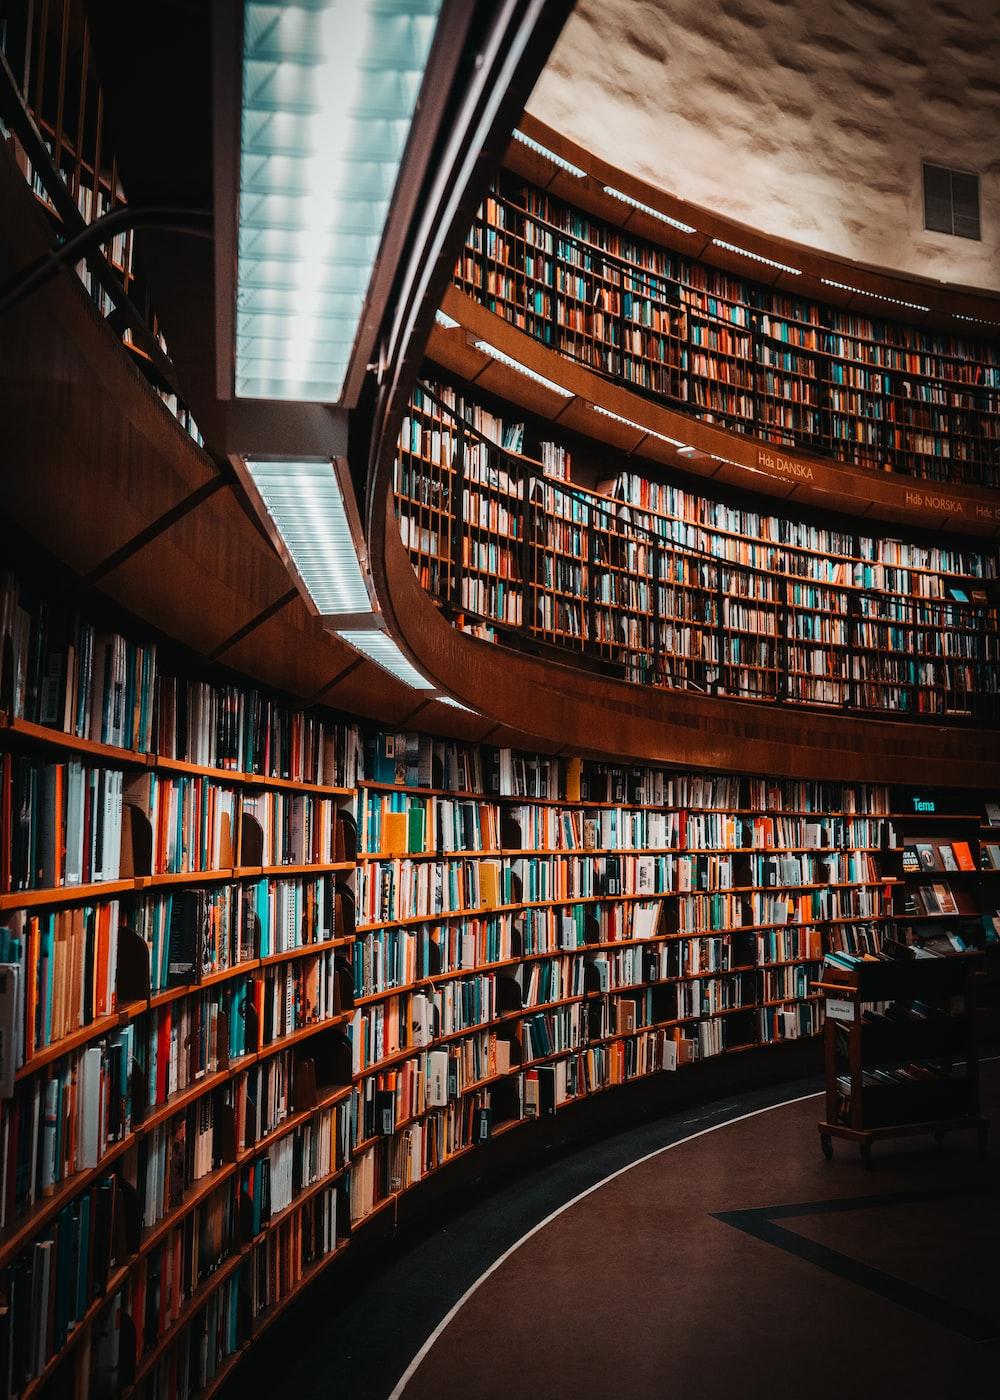 photo of brown wooden bookshelf